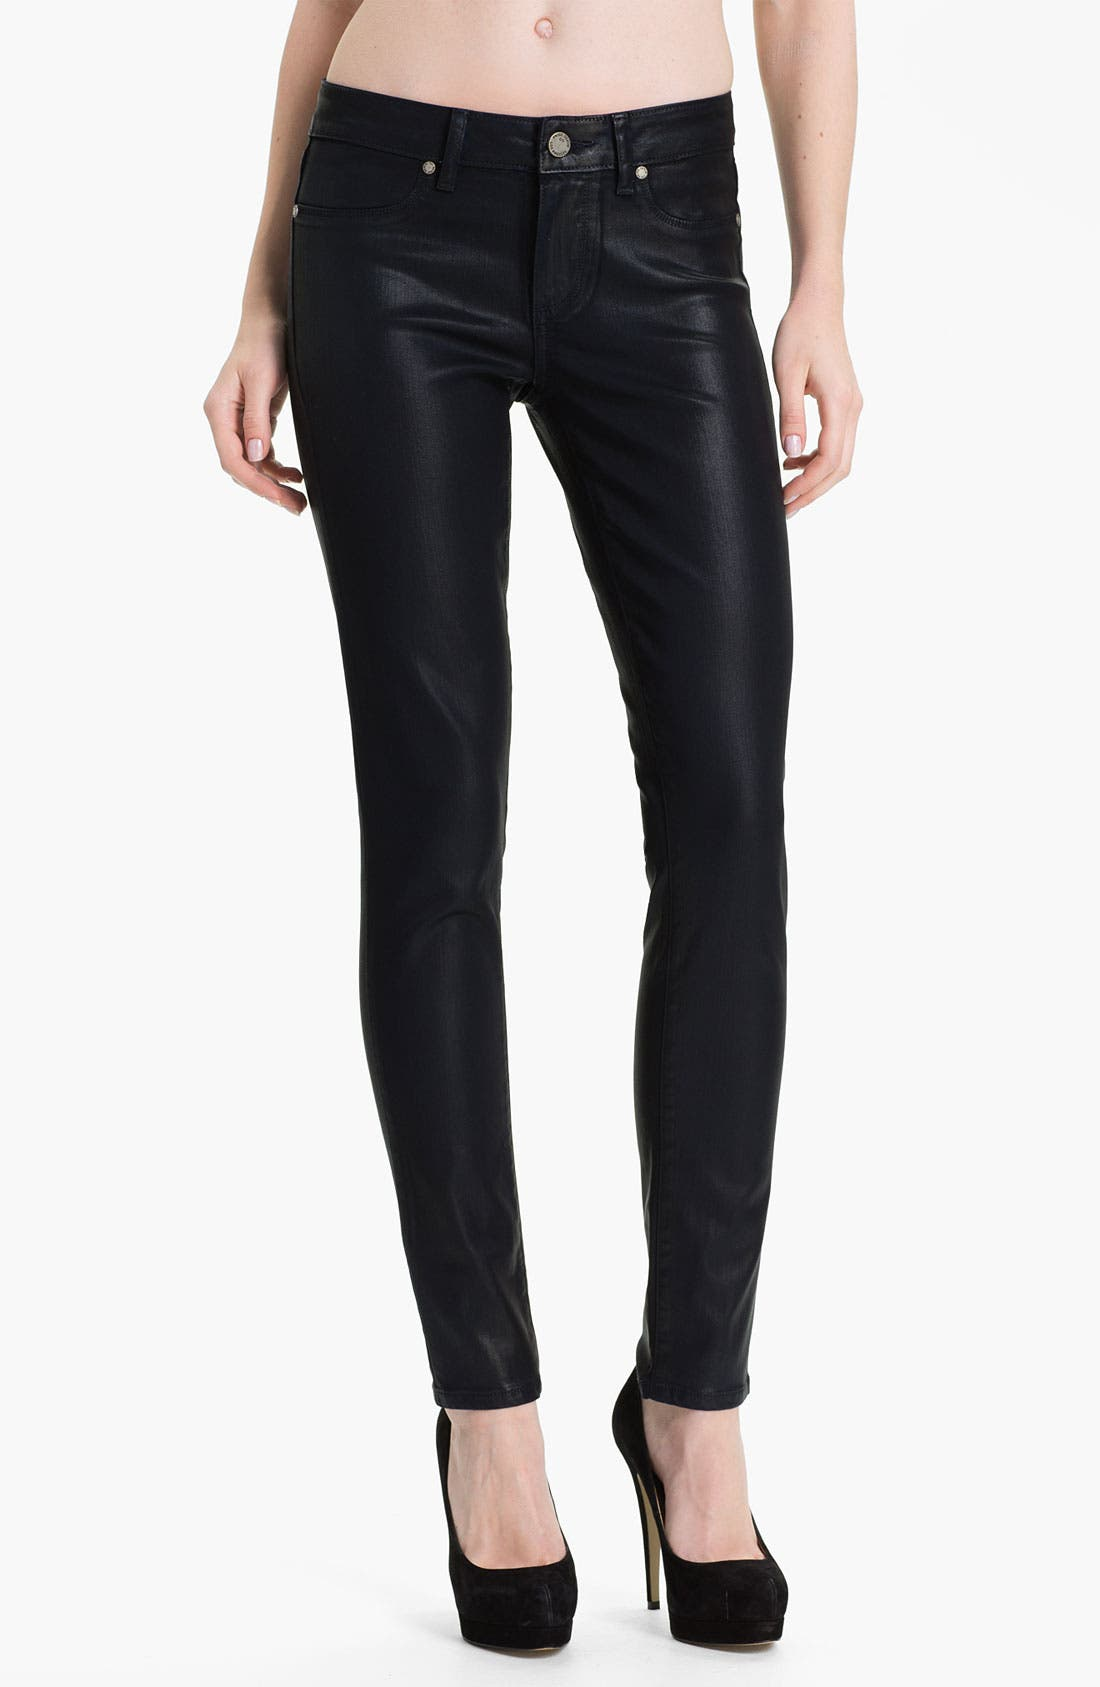 Alternate Image 1 Selected - Paige Denim 'Verdugo' Coated Stretch Denim Jeans (Azure Silk)